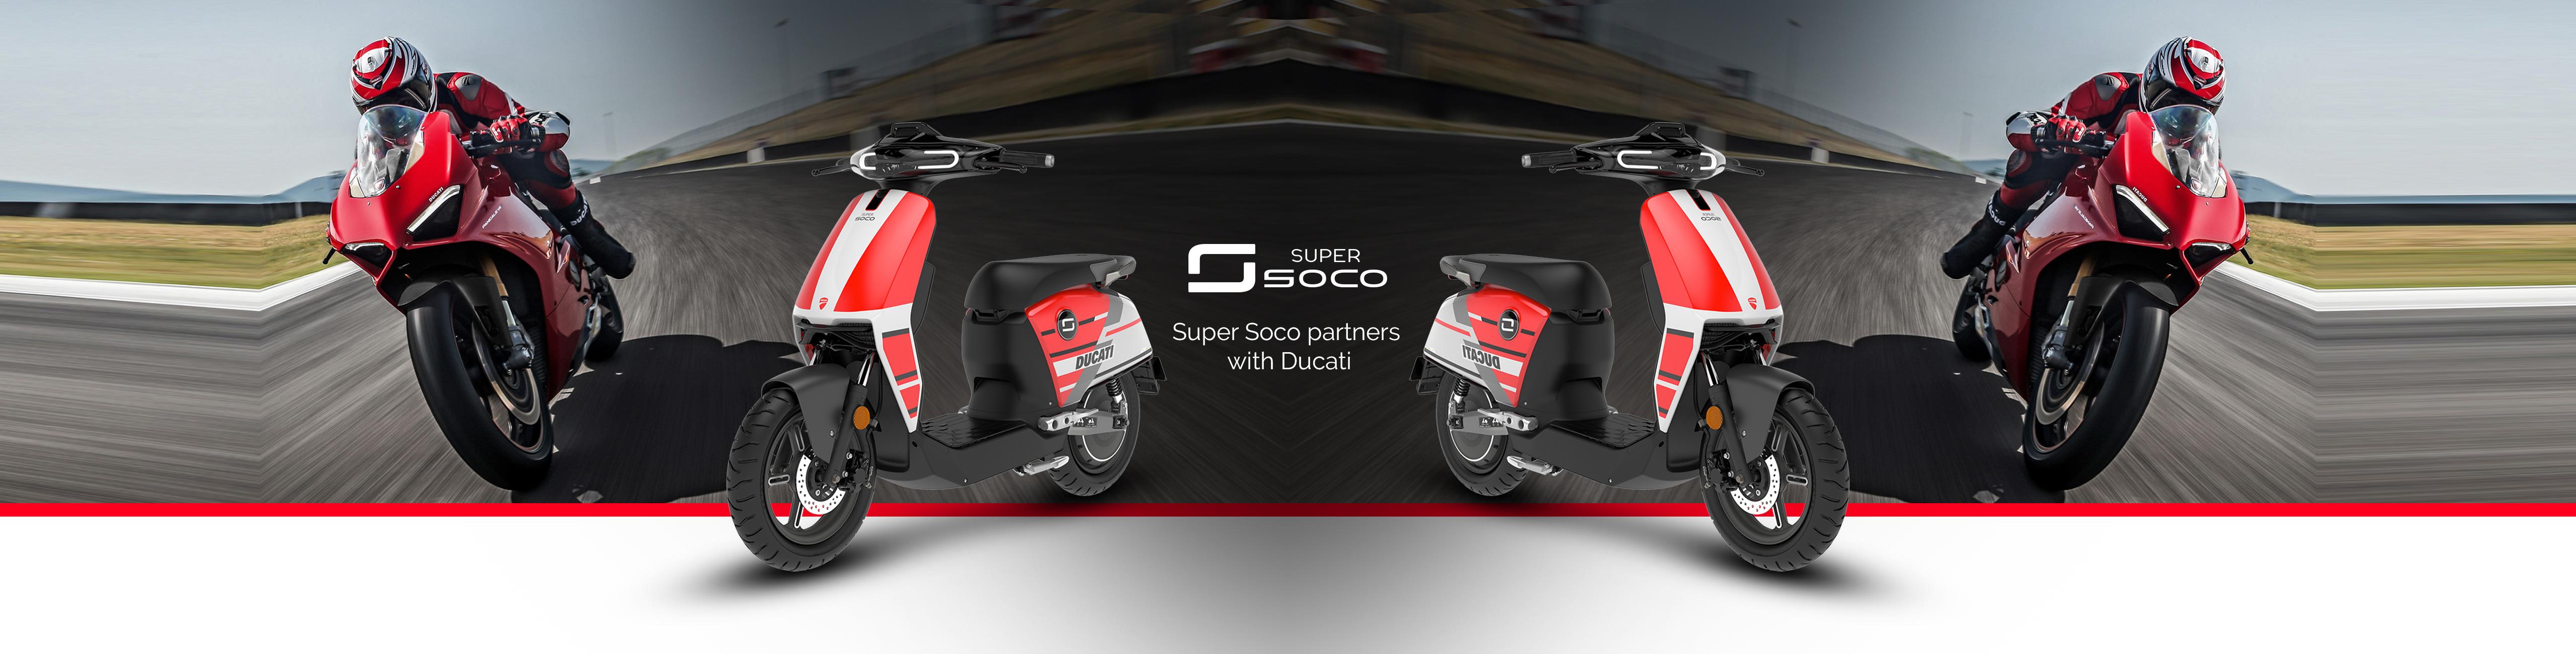 super_socco_ducati_slider_320920022